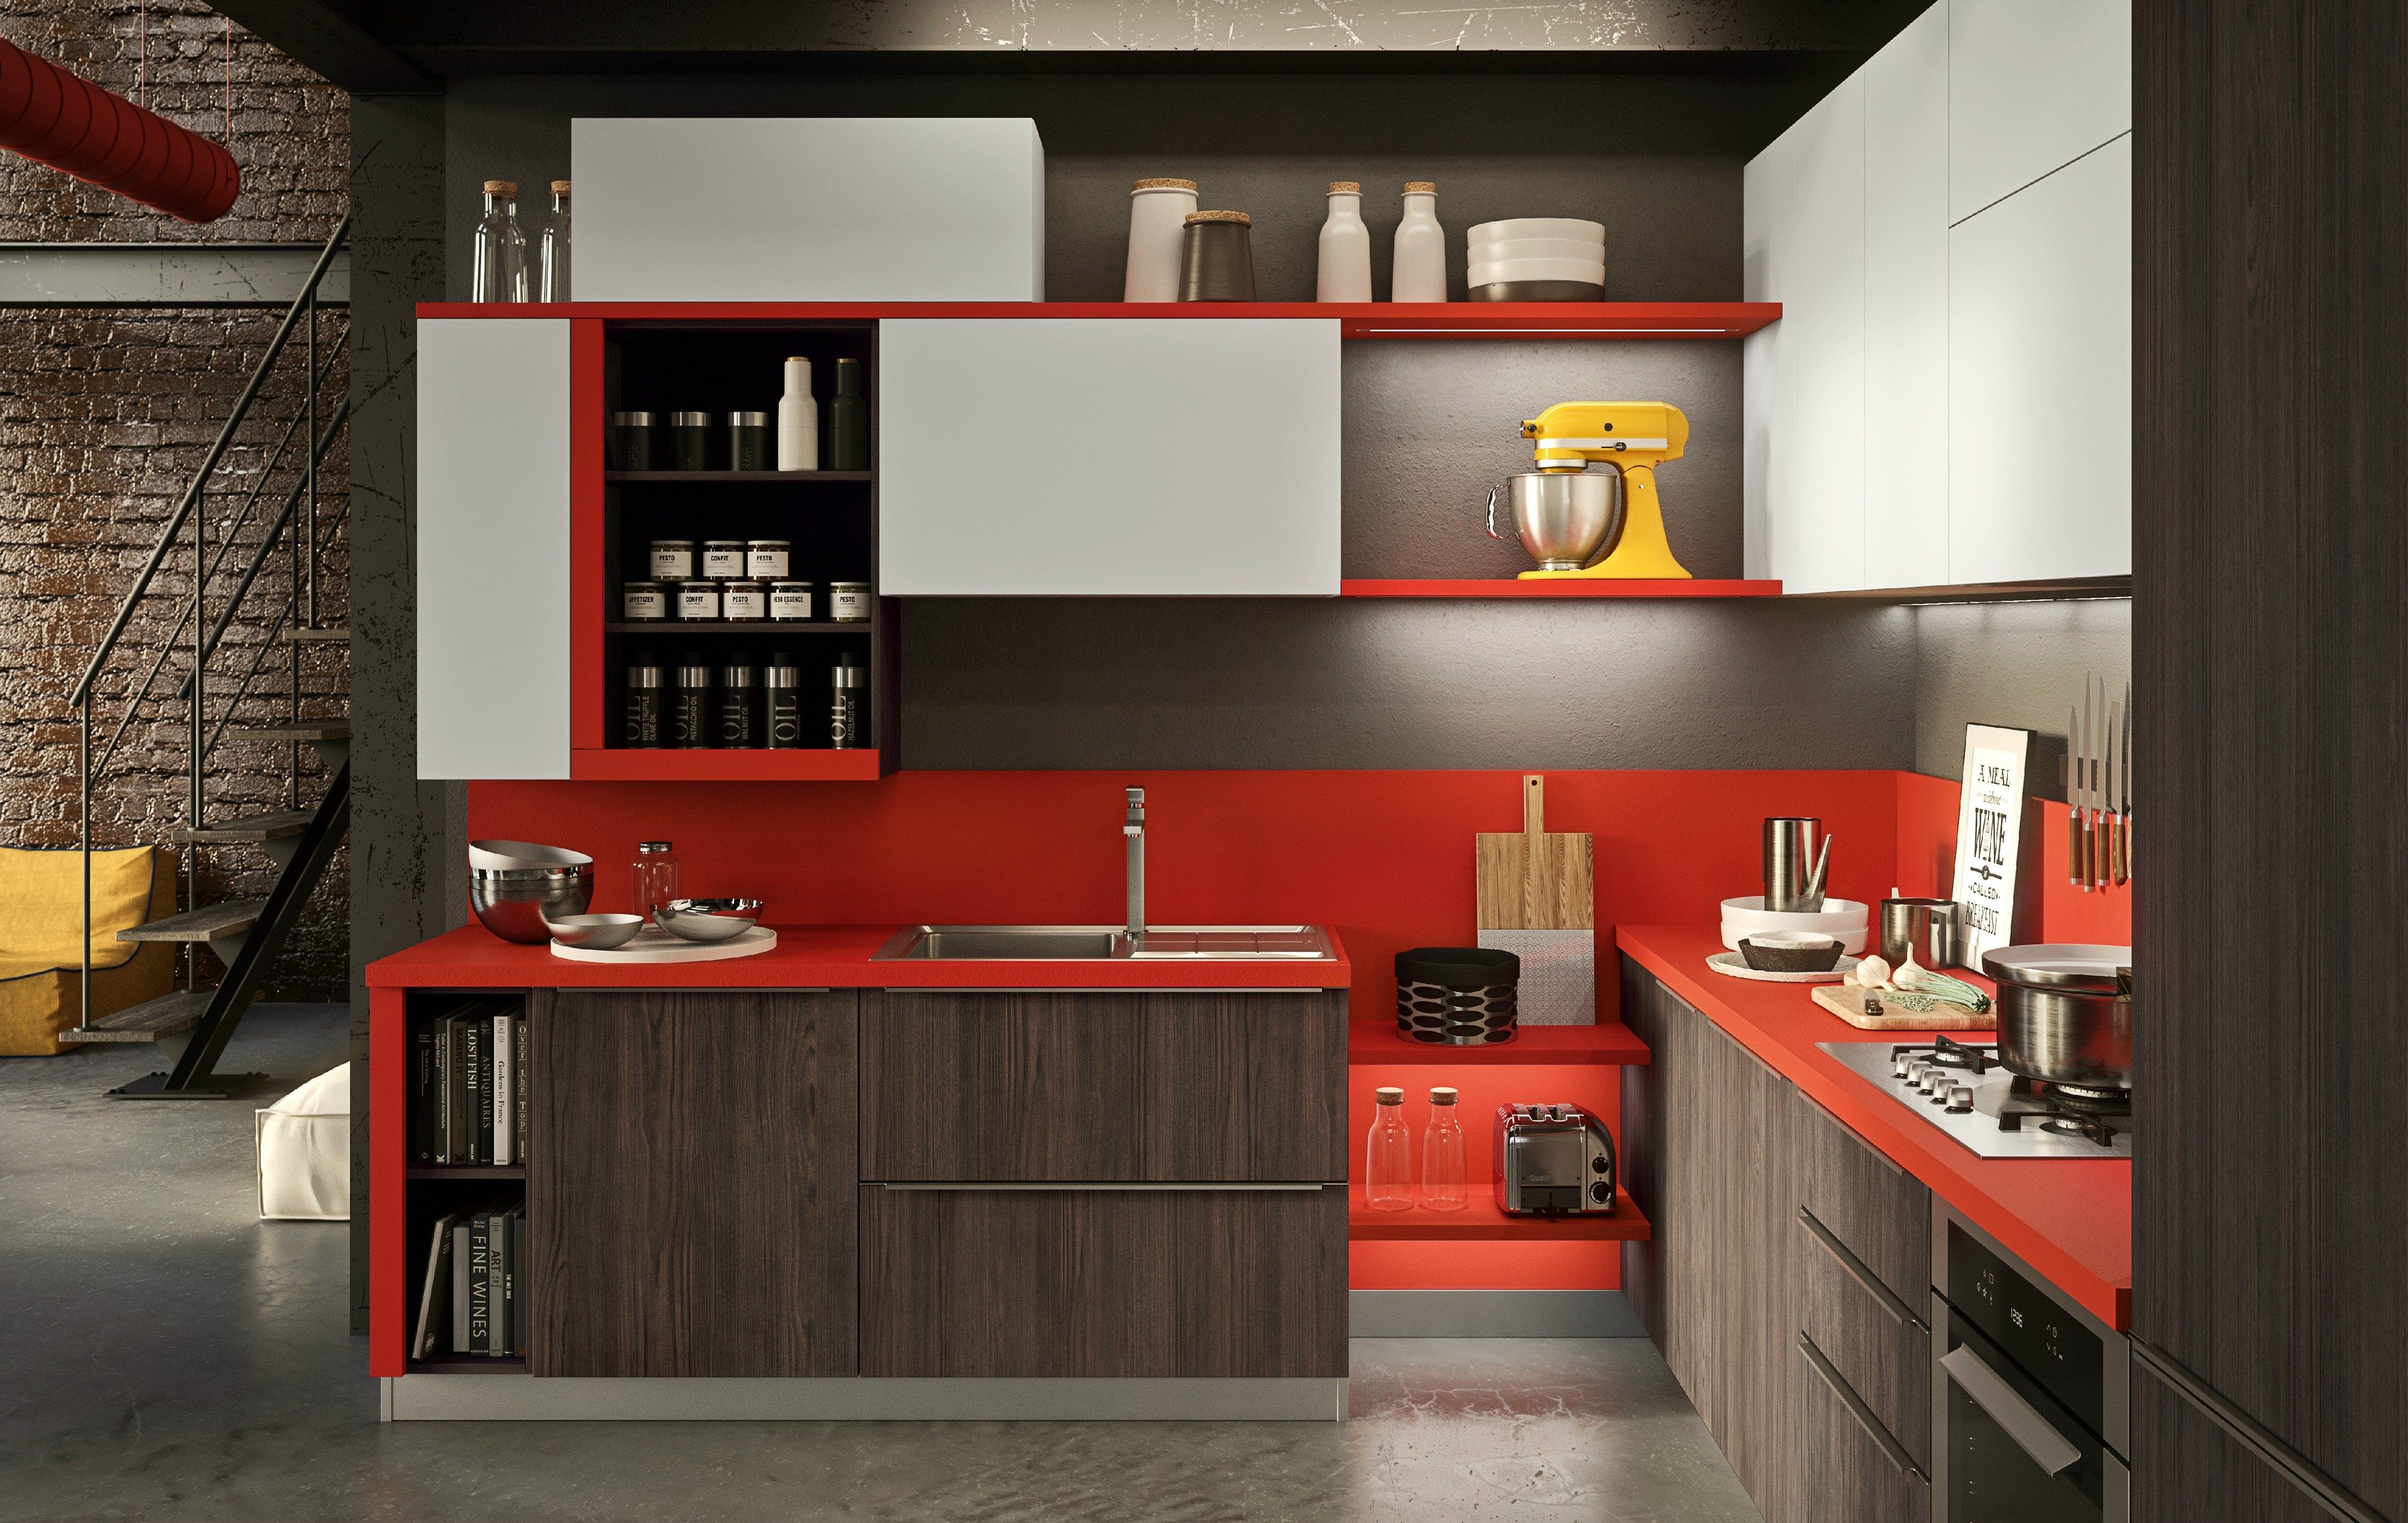 Fitted Kitchen With Integrated Handles Strip Abaco By Snaidero By Snaidero Design Snaidero Desi Modern Kitchen Design Kitchen Cabinet Styles Kitchen Fittings